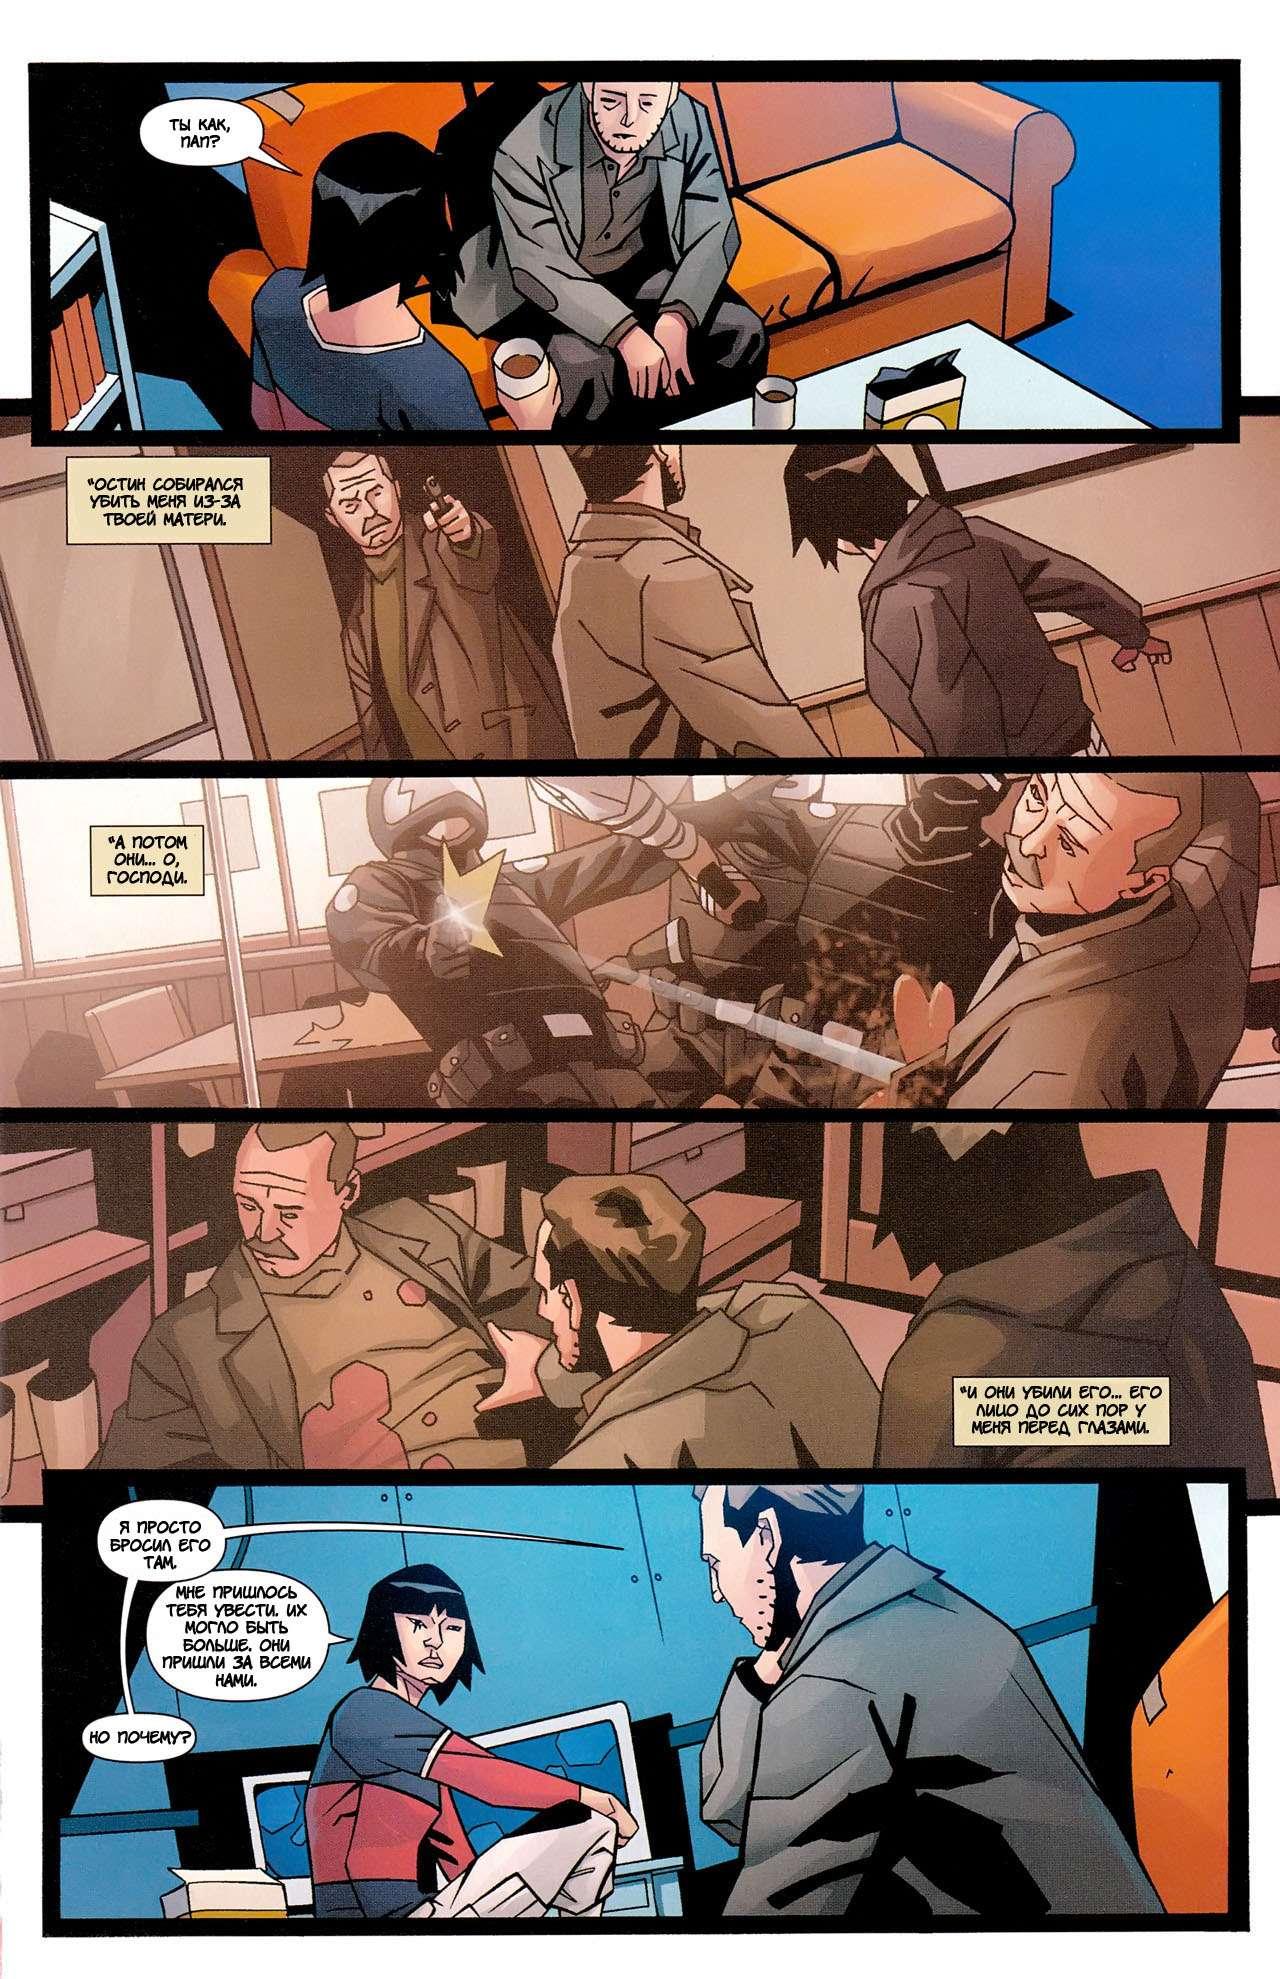 mirrors-edge-05-pg-09